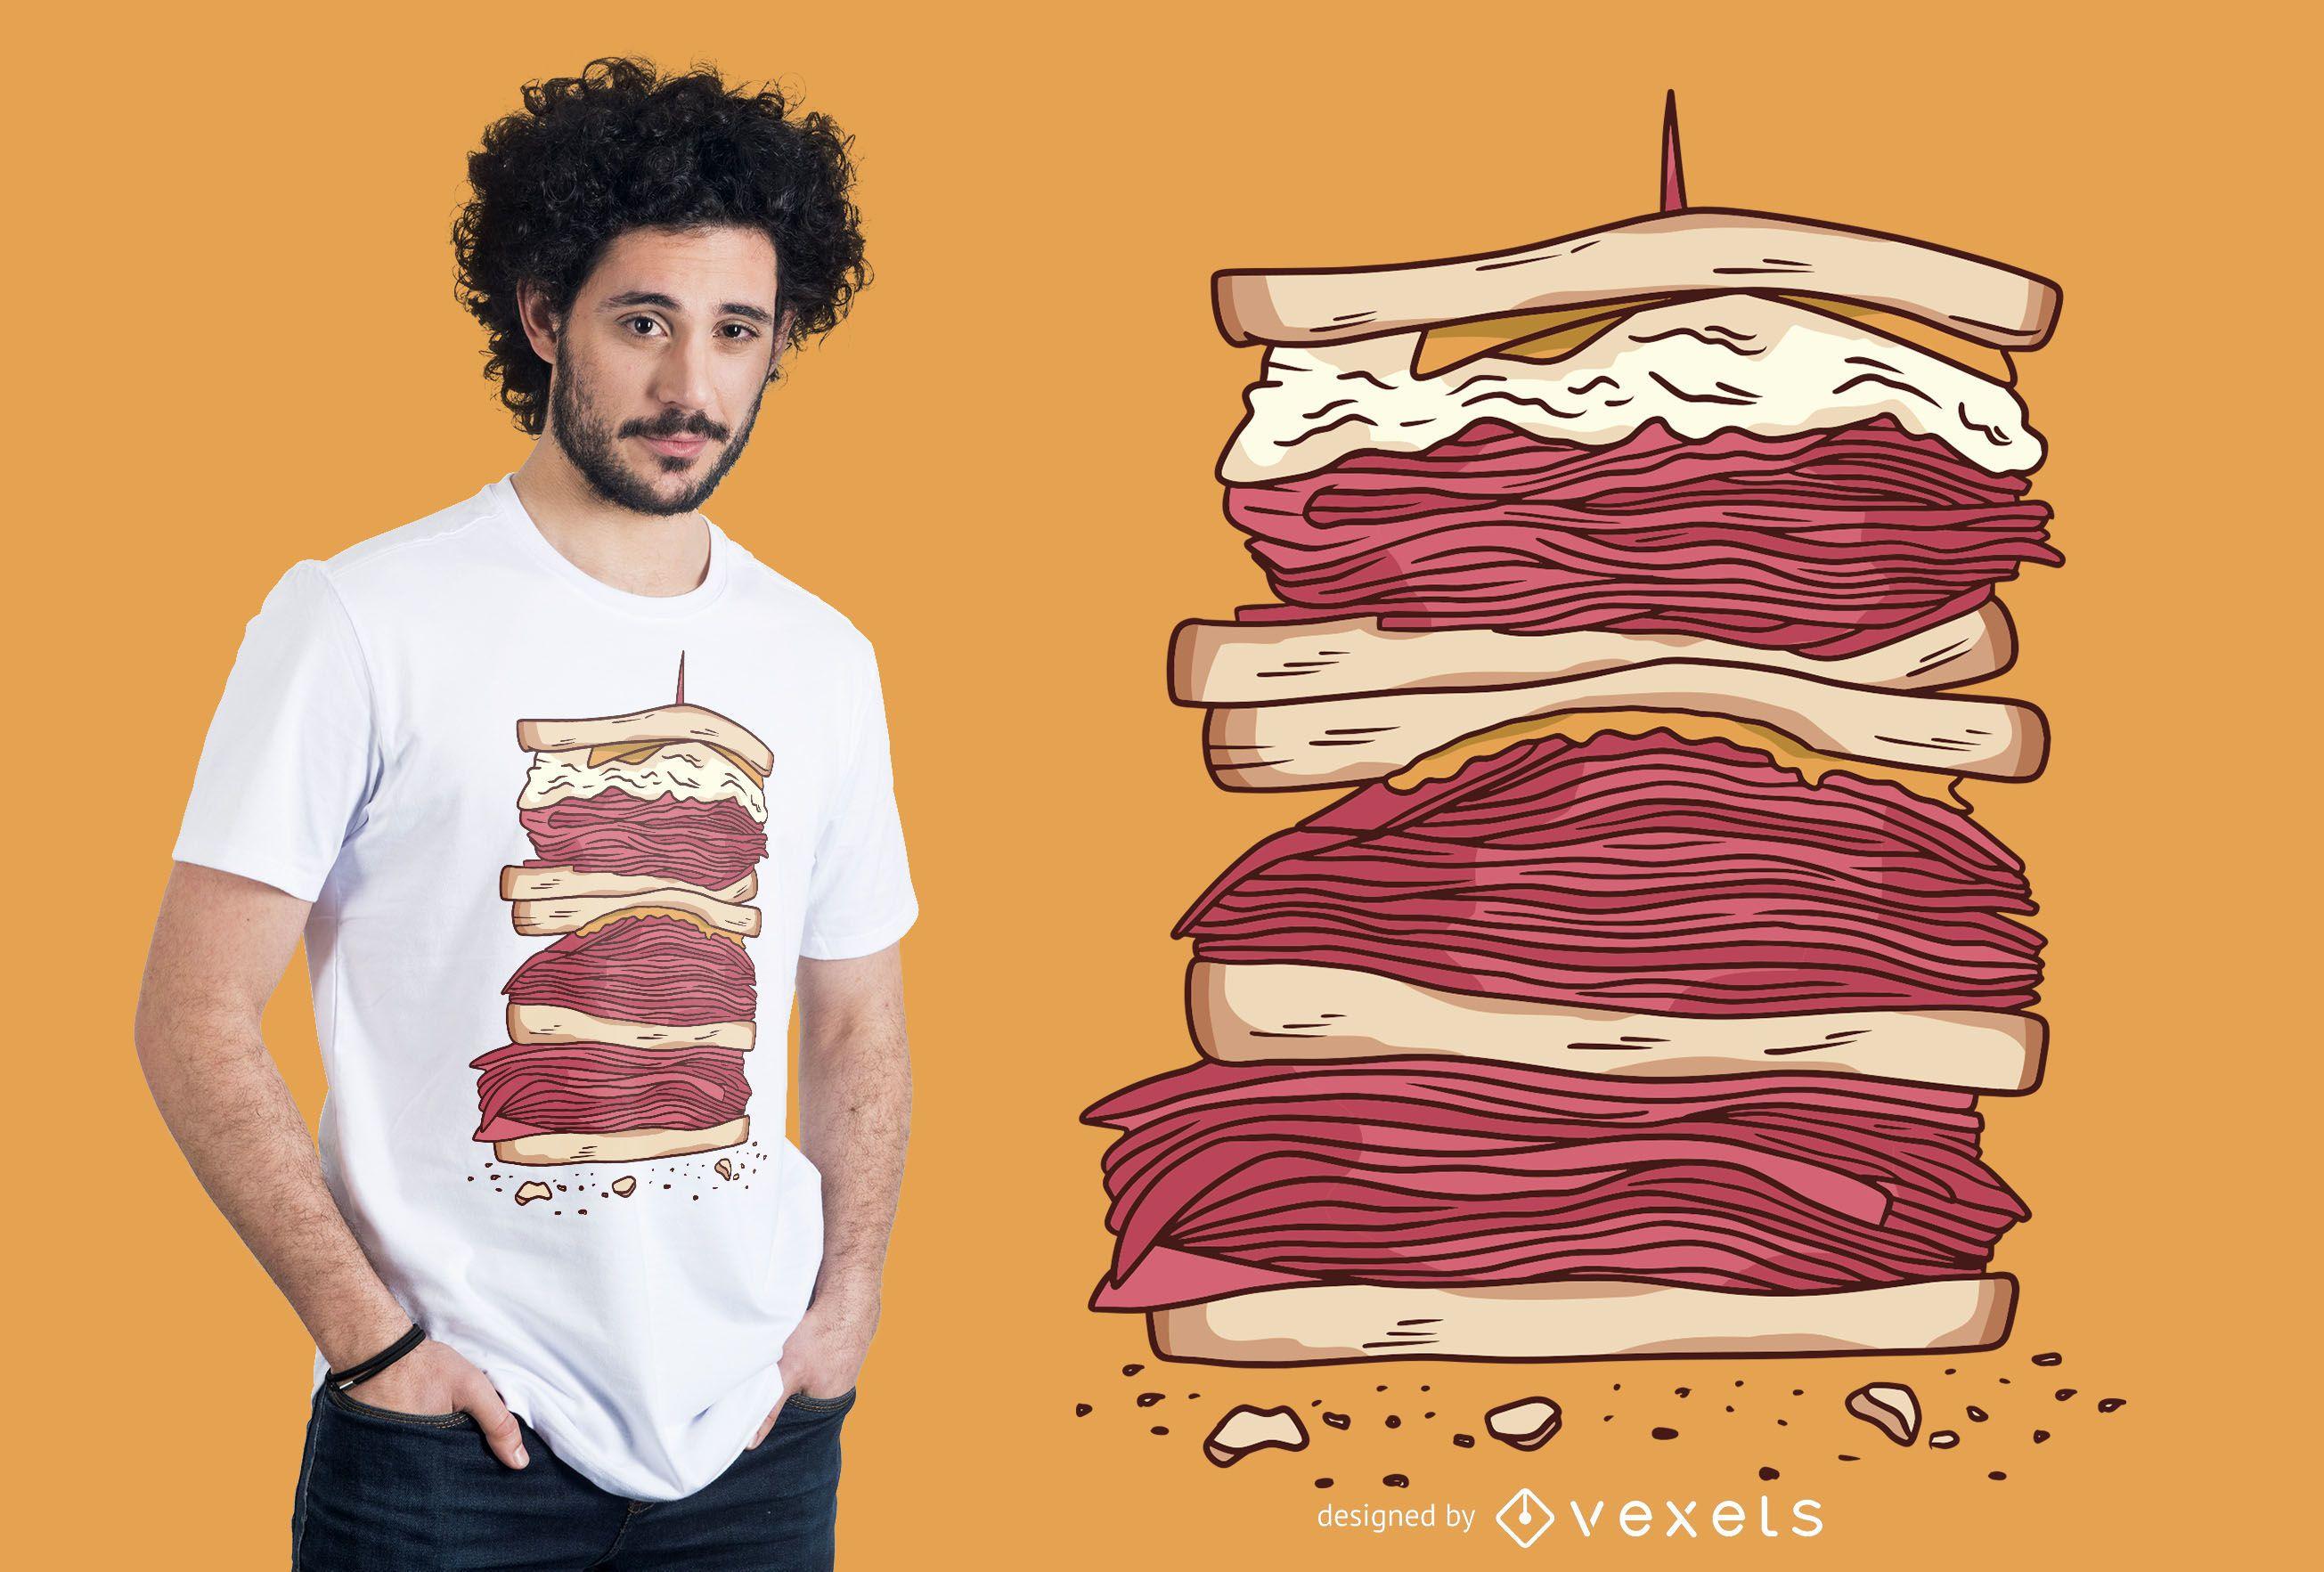 Meat sandwich t-shirt design